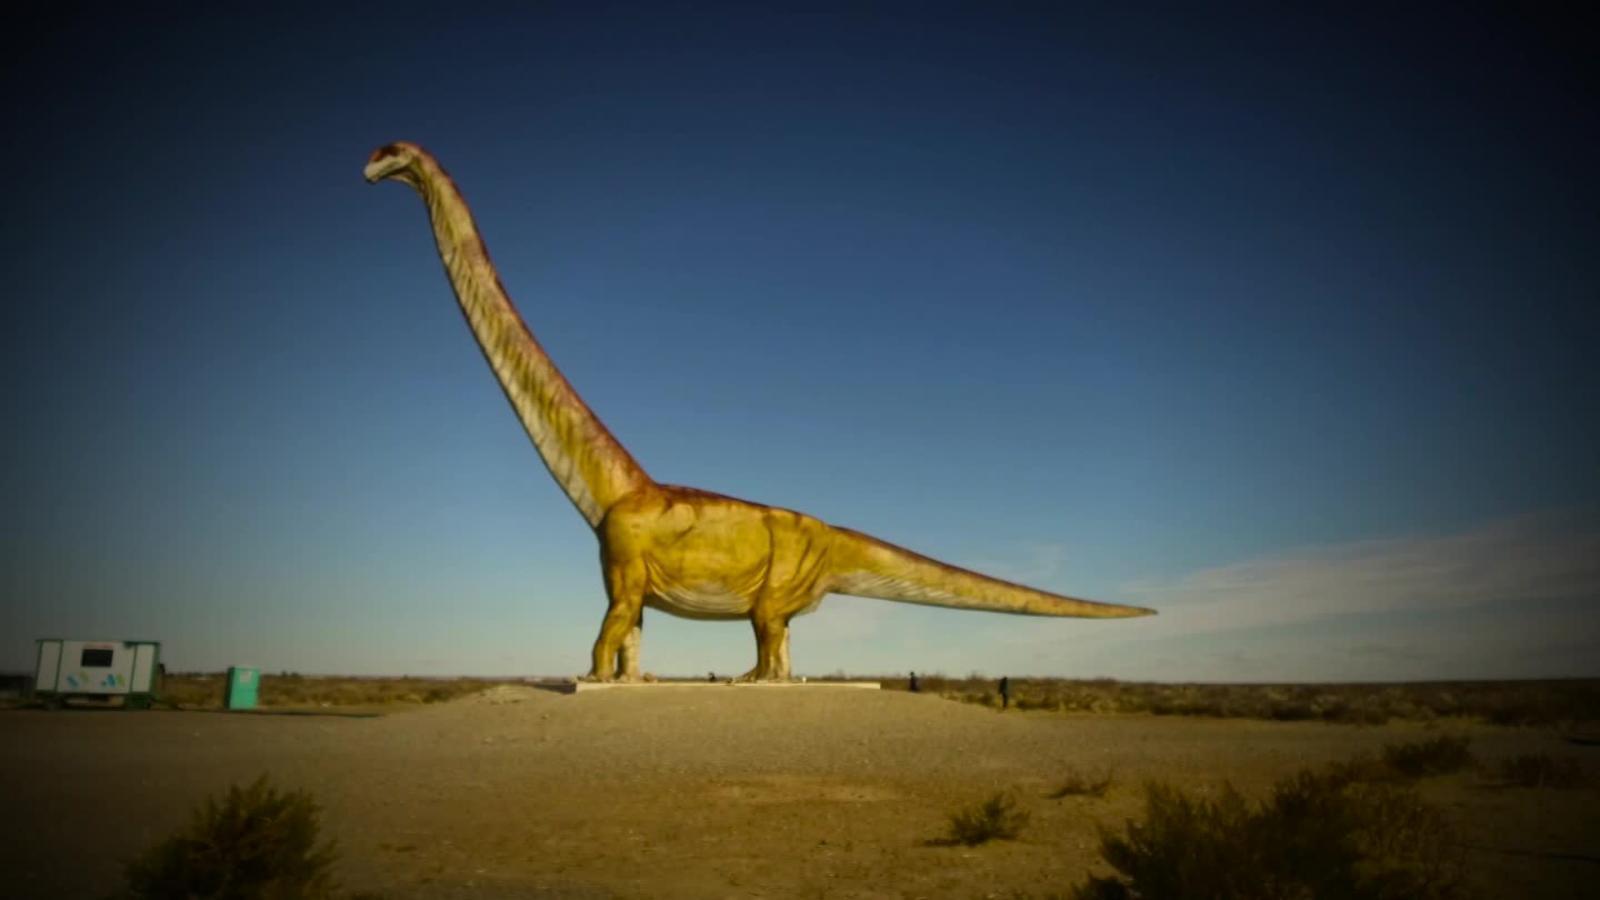 ¿Por qué se han descubierto tantos dinosaurios en Argentina? https://t.co/txmoTMp13z Sigue a @CNNArgentina https://t.co/31PrdRNBCy